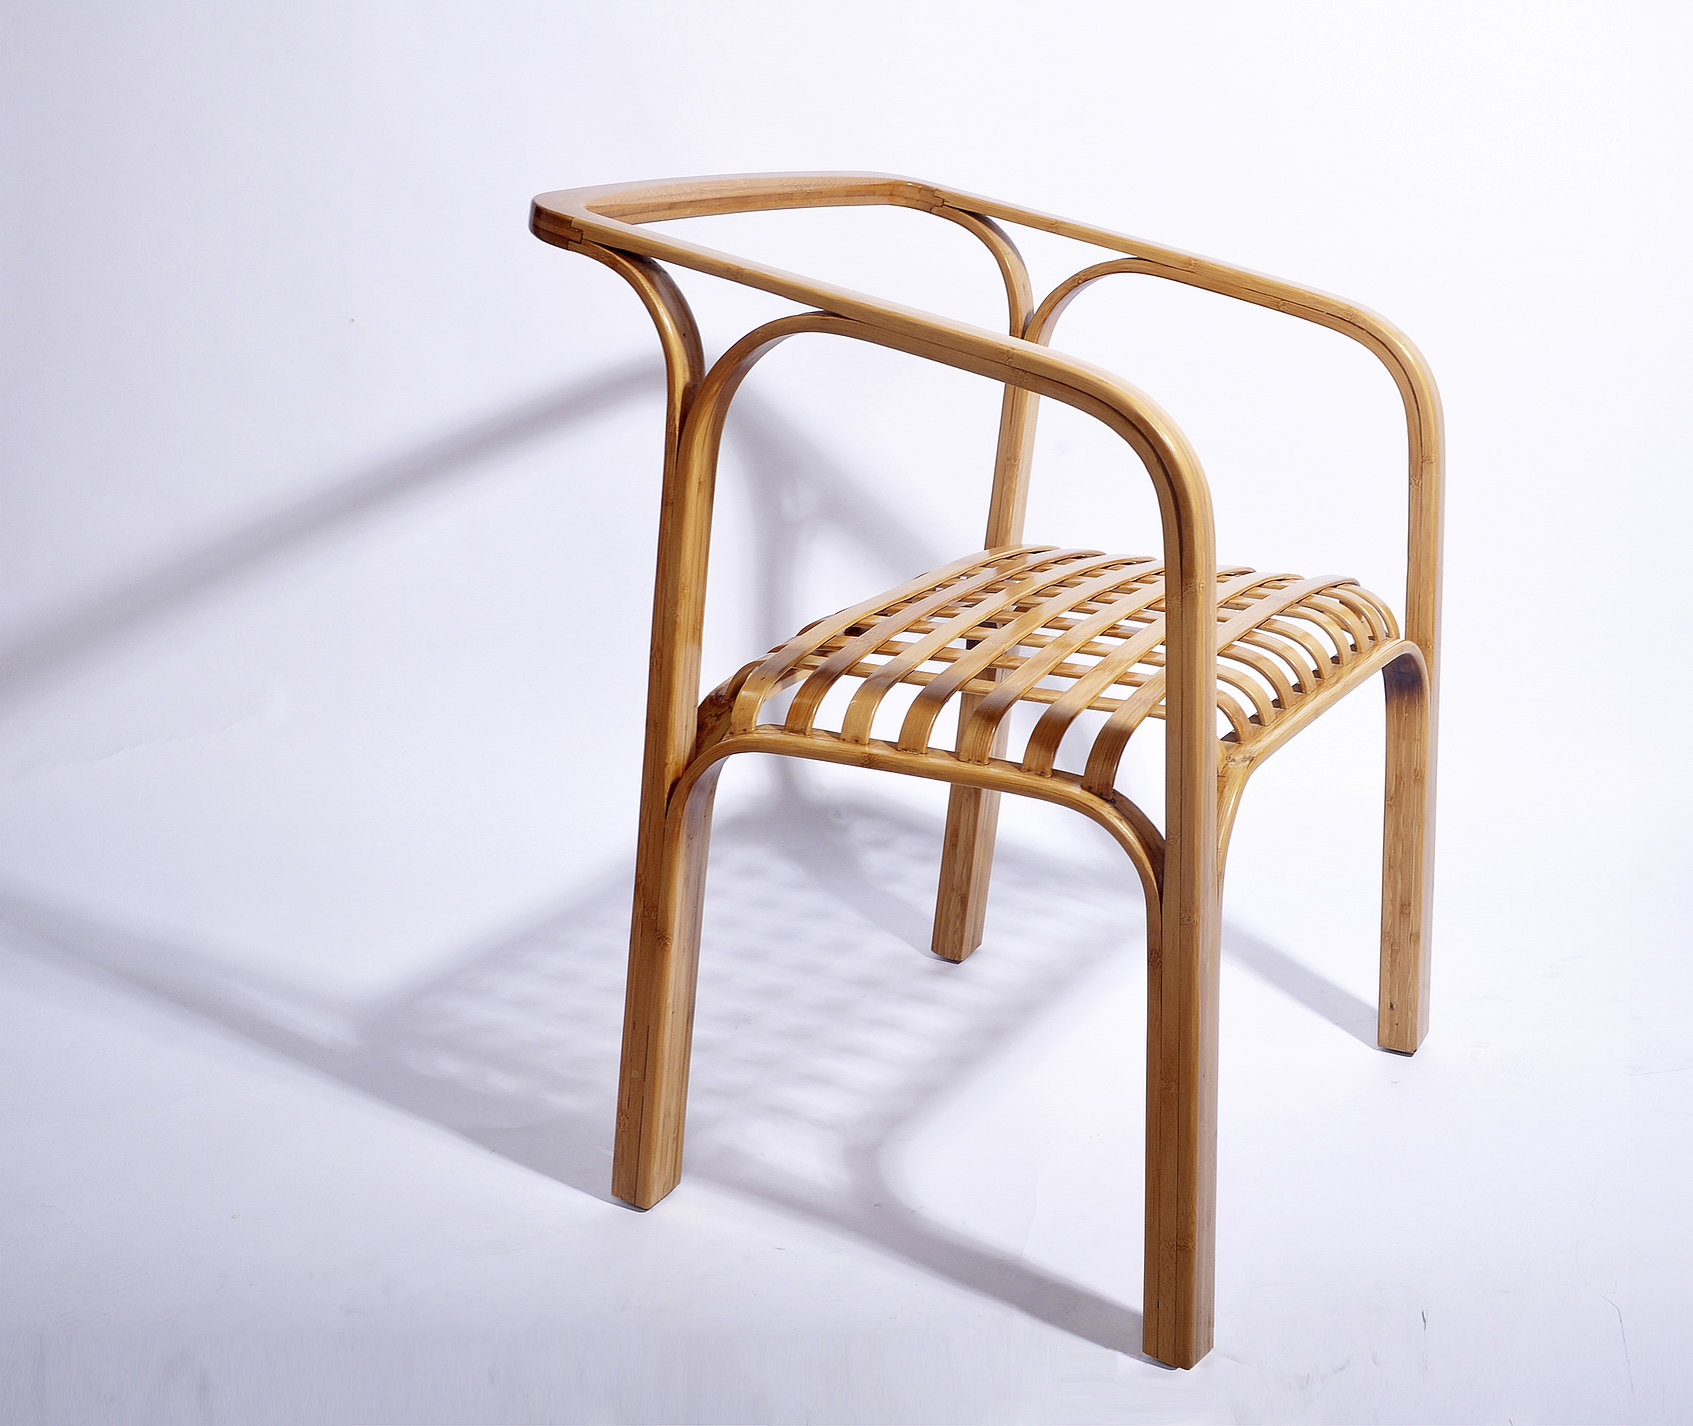 Bamboo Chair | Red Dot Design Award